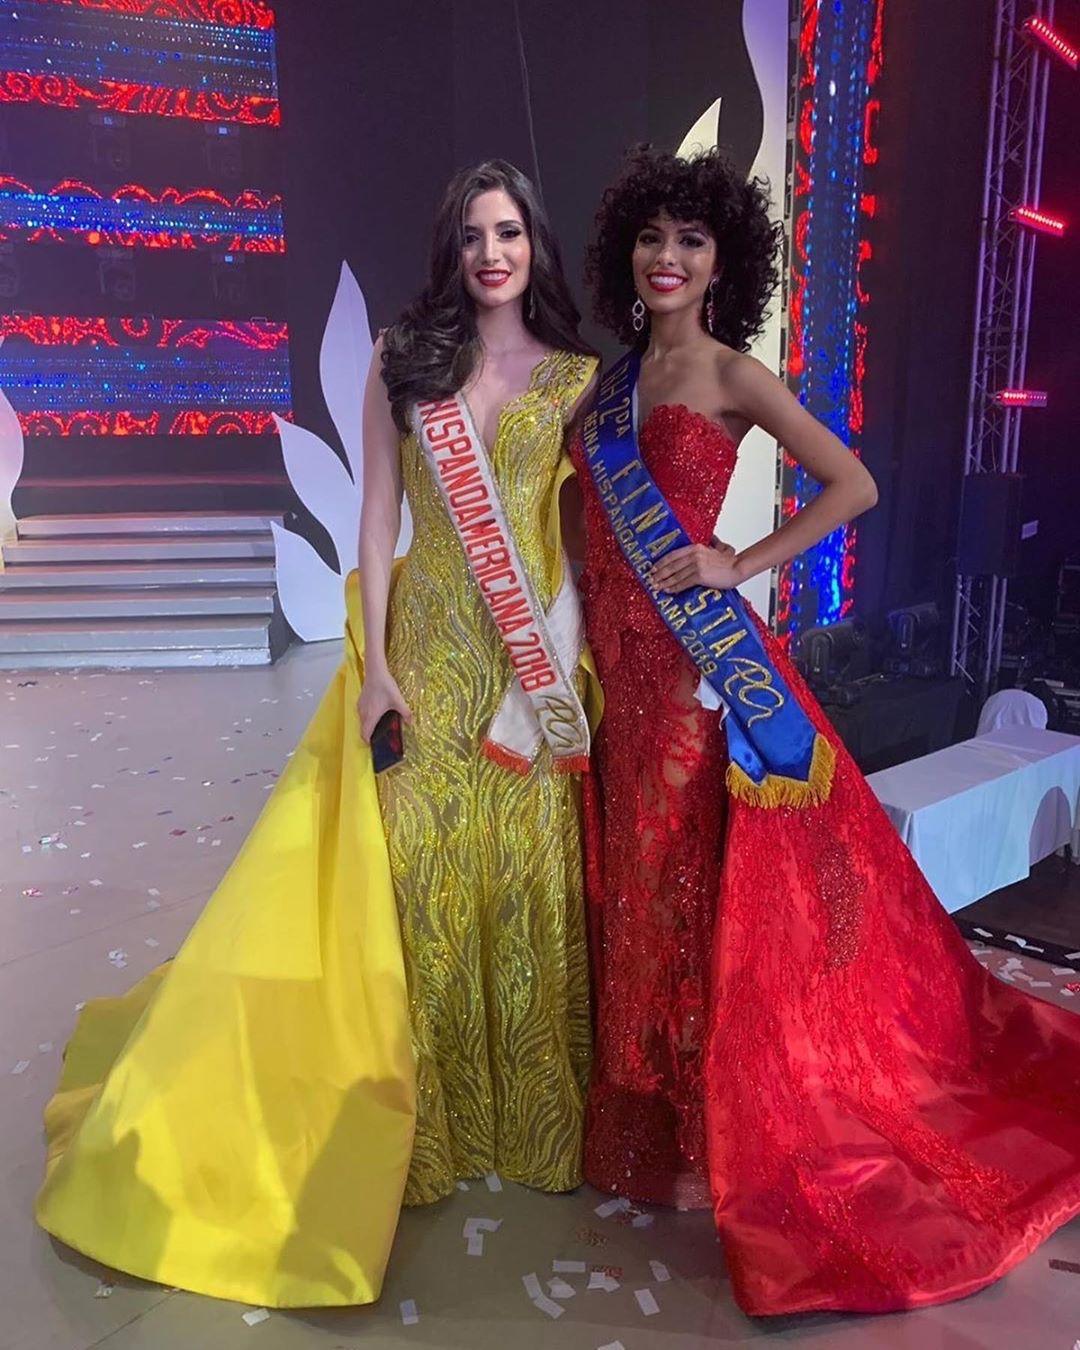 nariman battikha, reyna hispanoamericana 2018/top 10 de miss supranational 2018. - Página 12 83898410